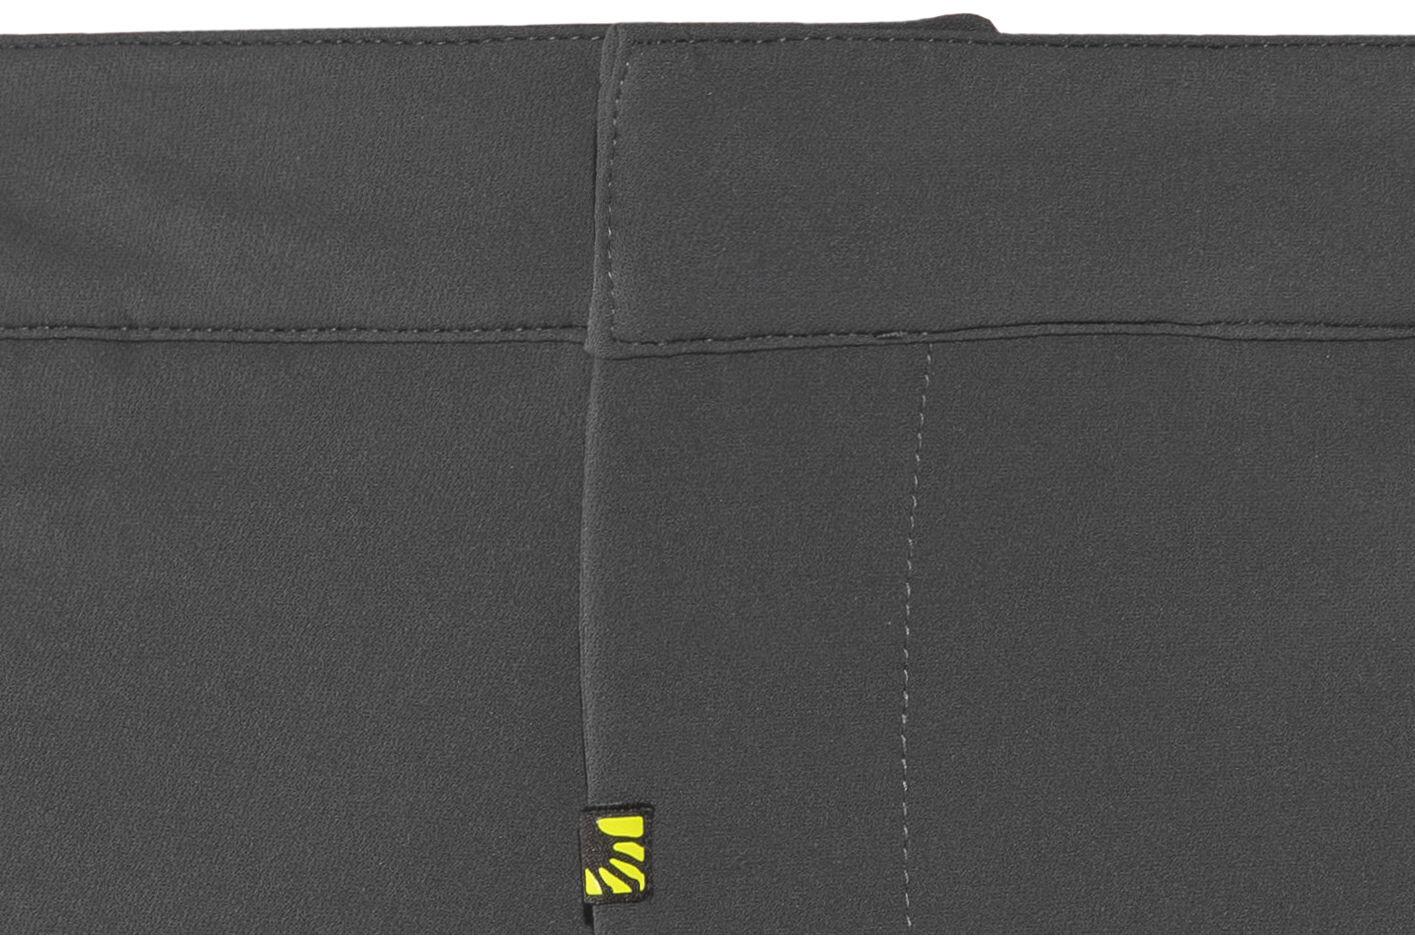 cc484b6091 Karpos Express 300 - Pantalones Hombre - gris negro